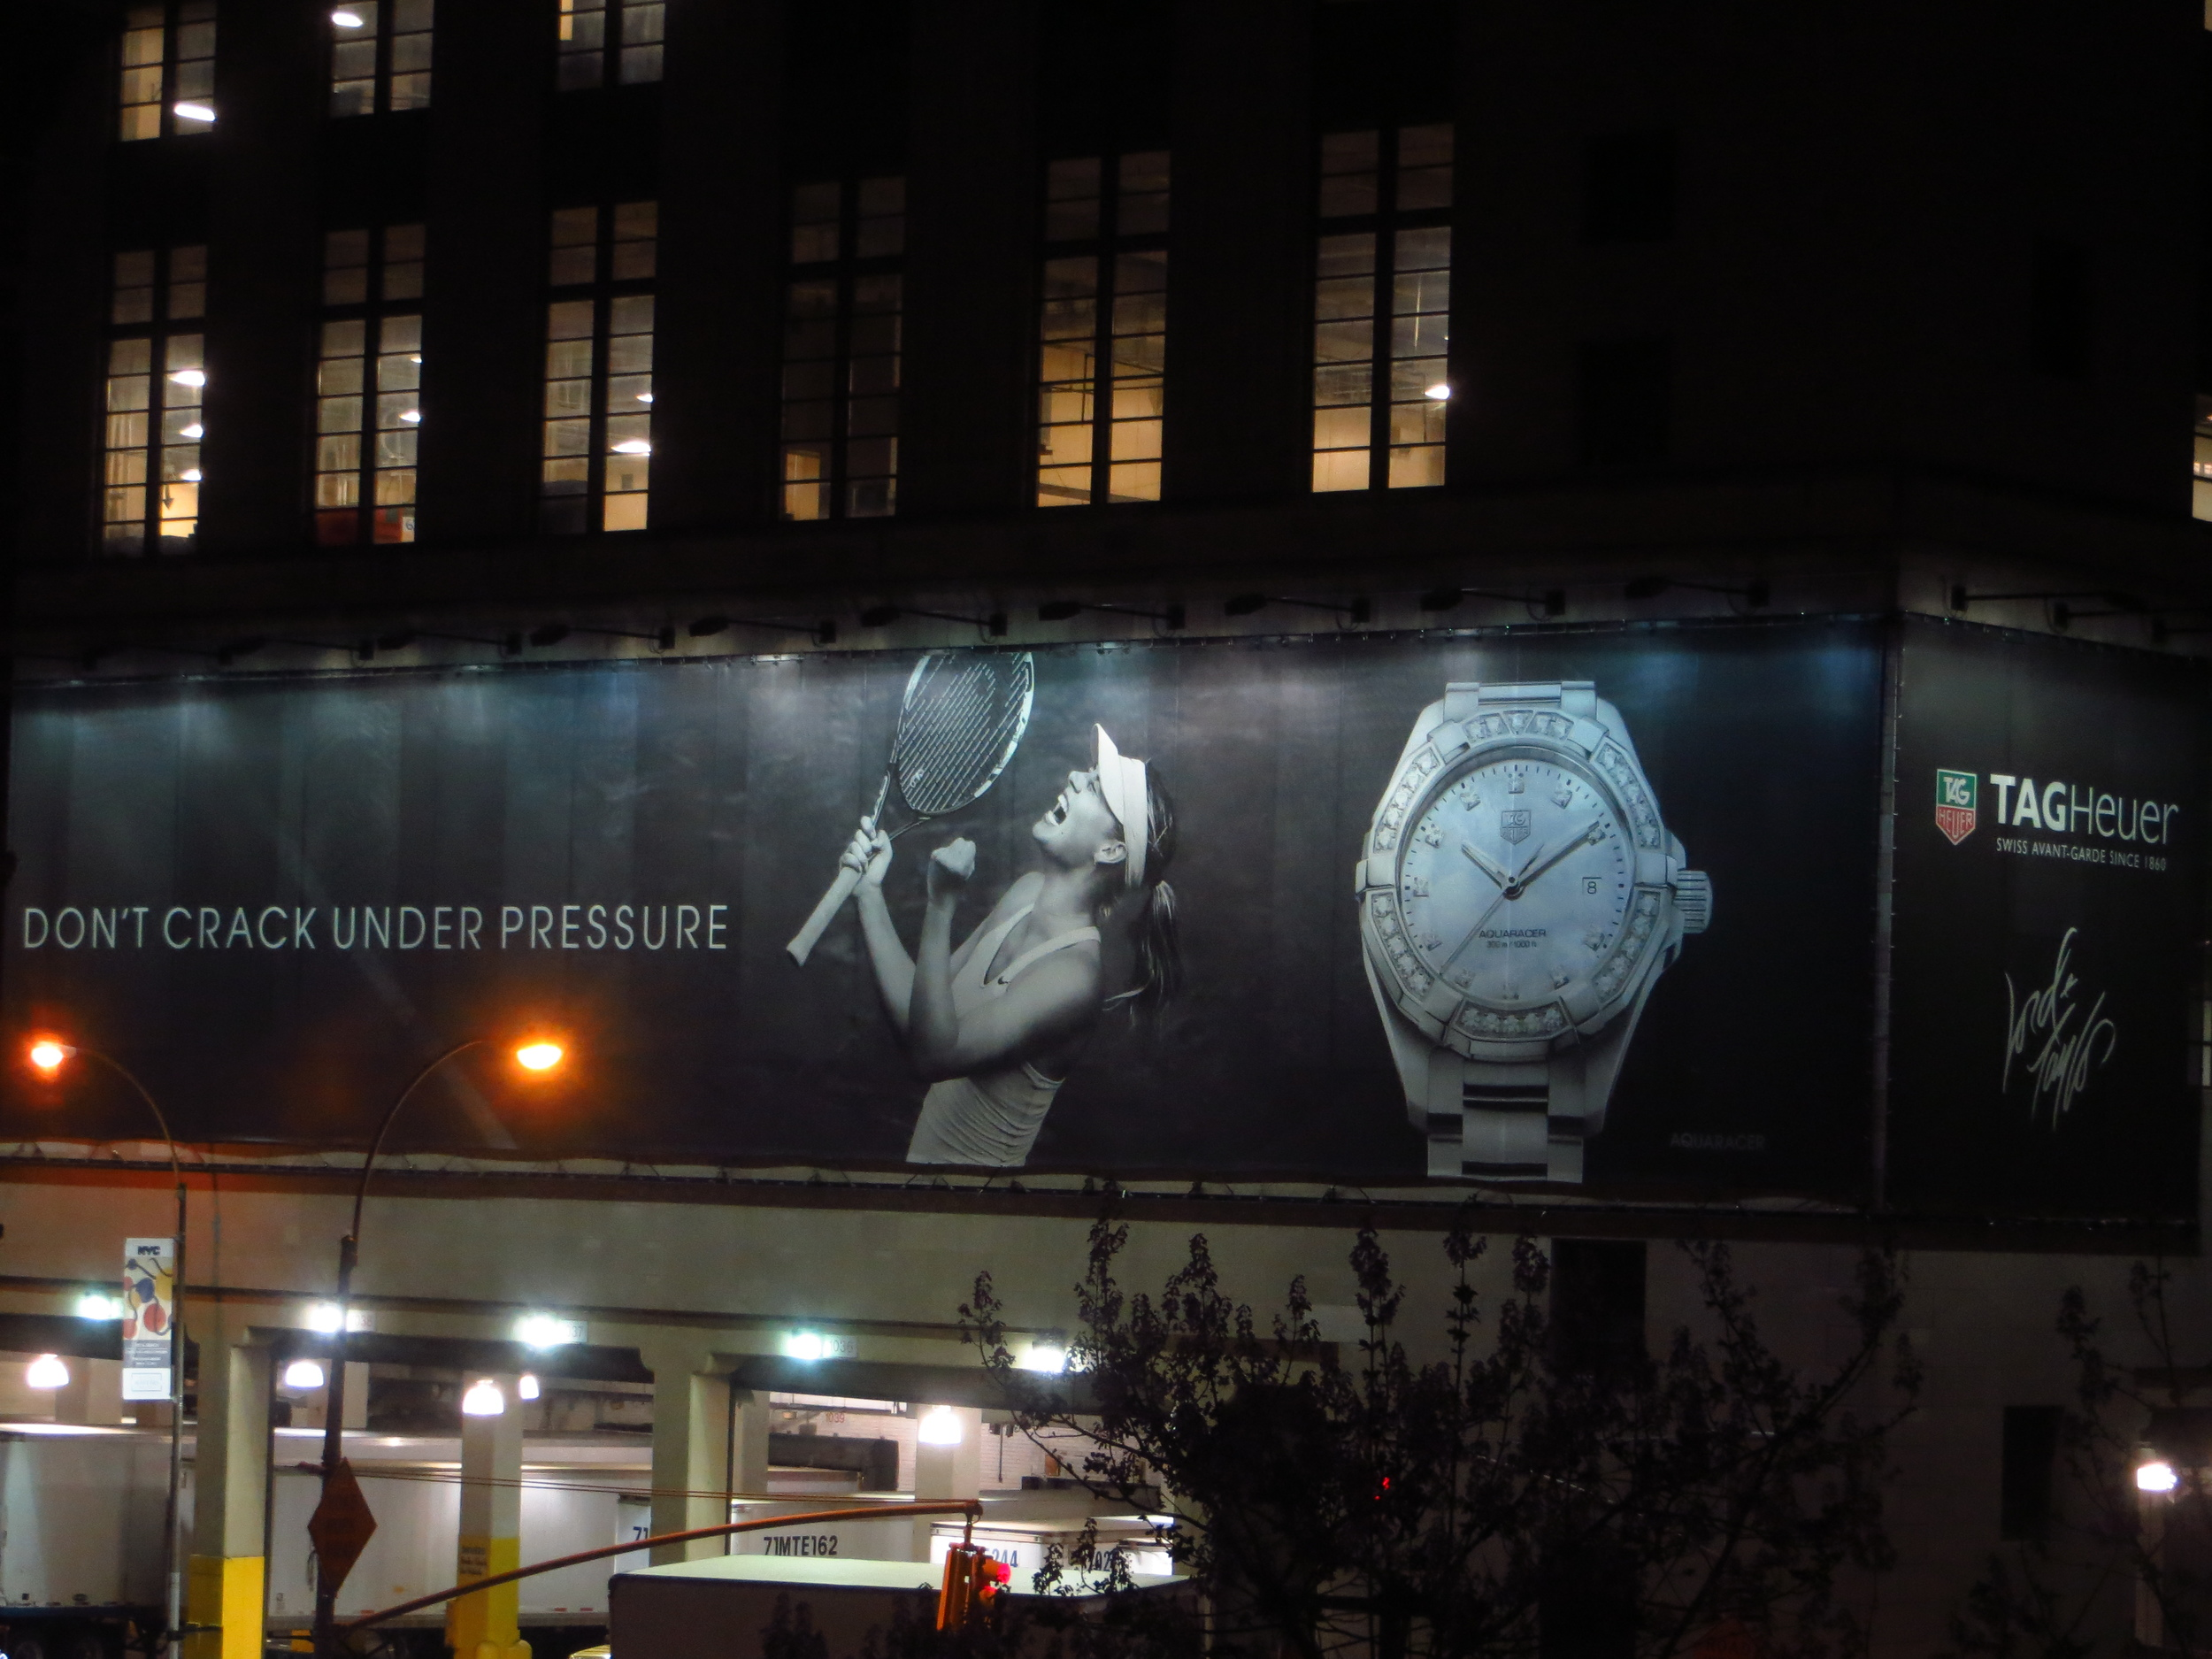 She's not wearing a watch...